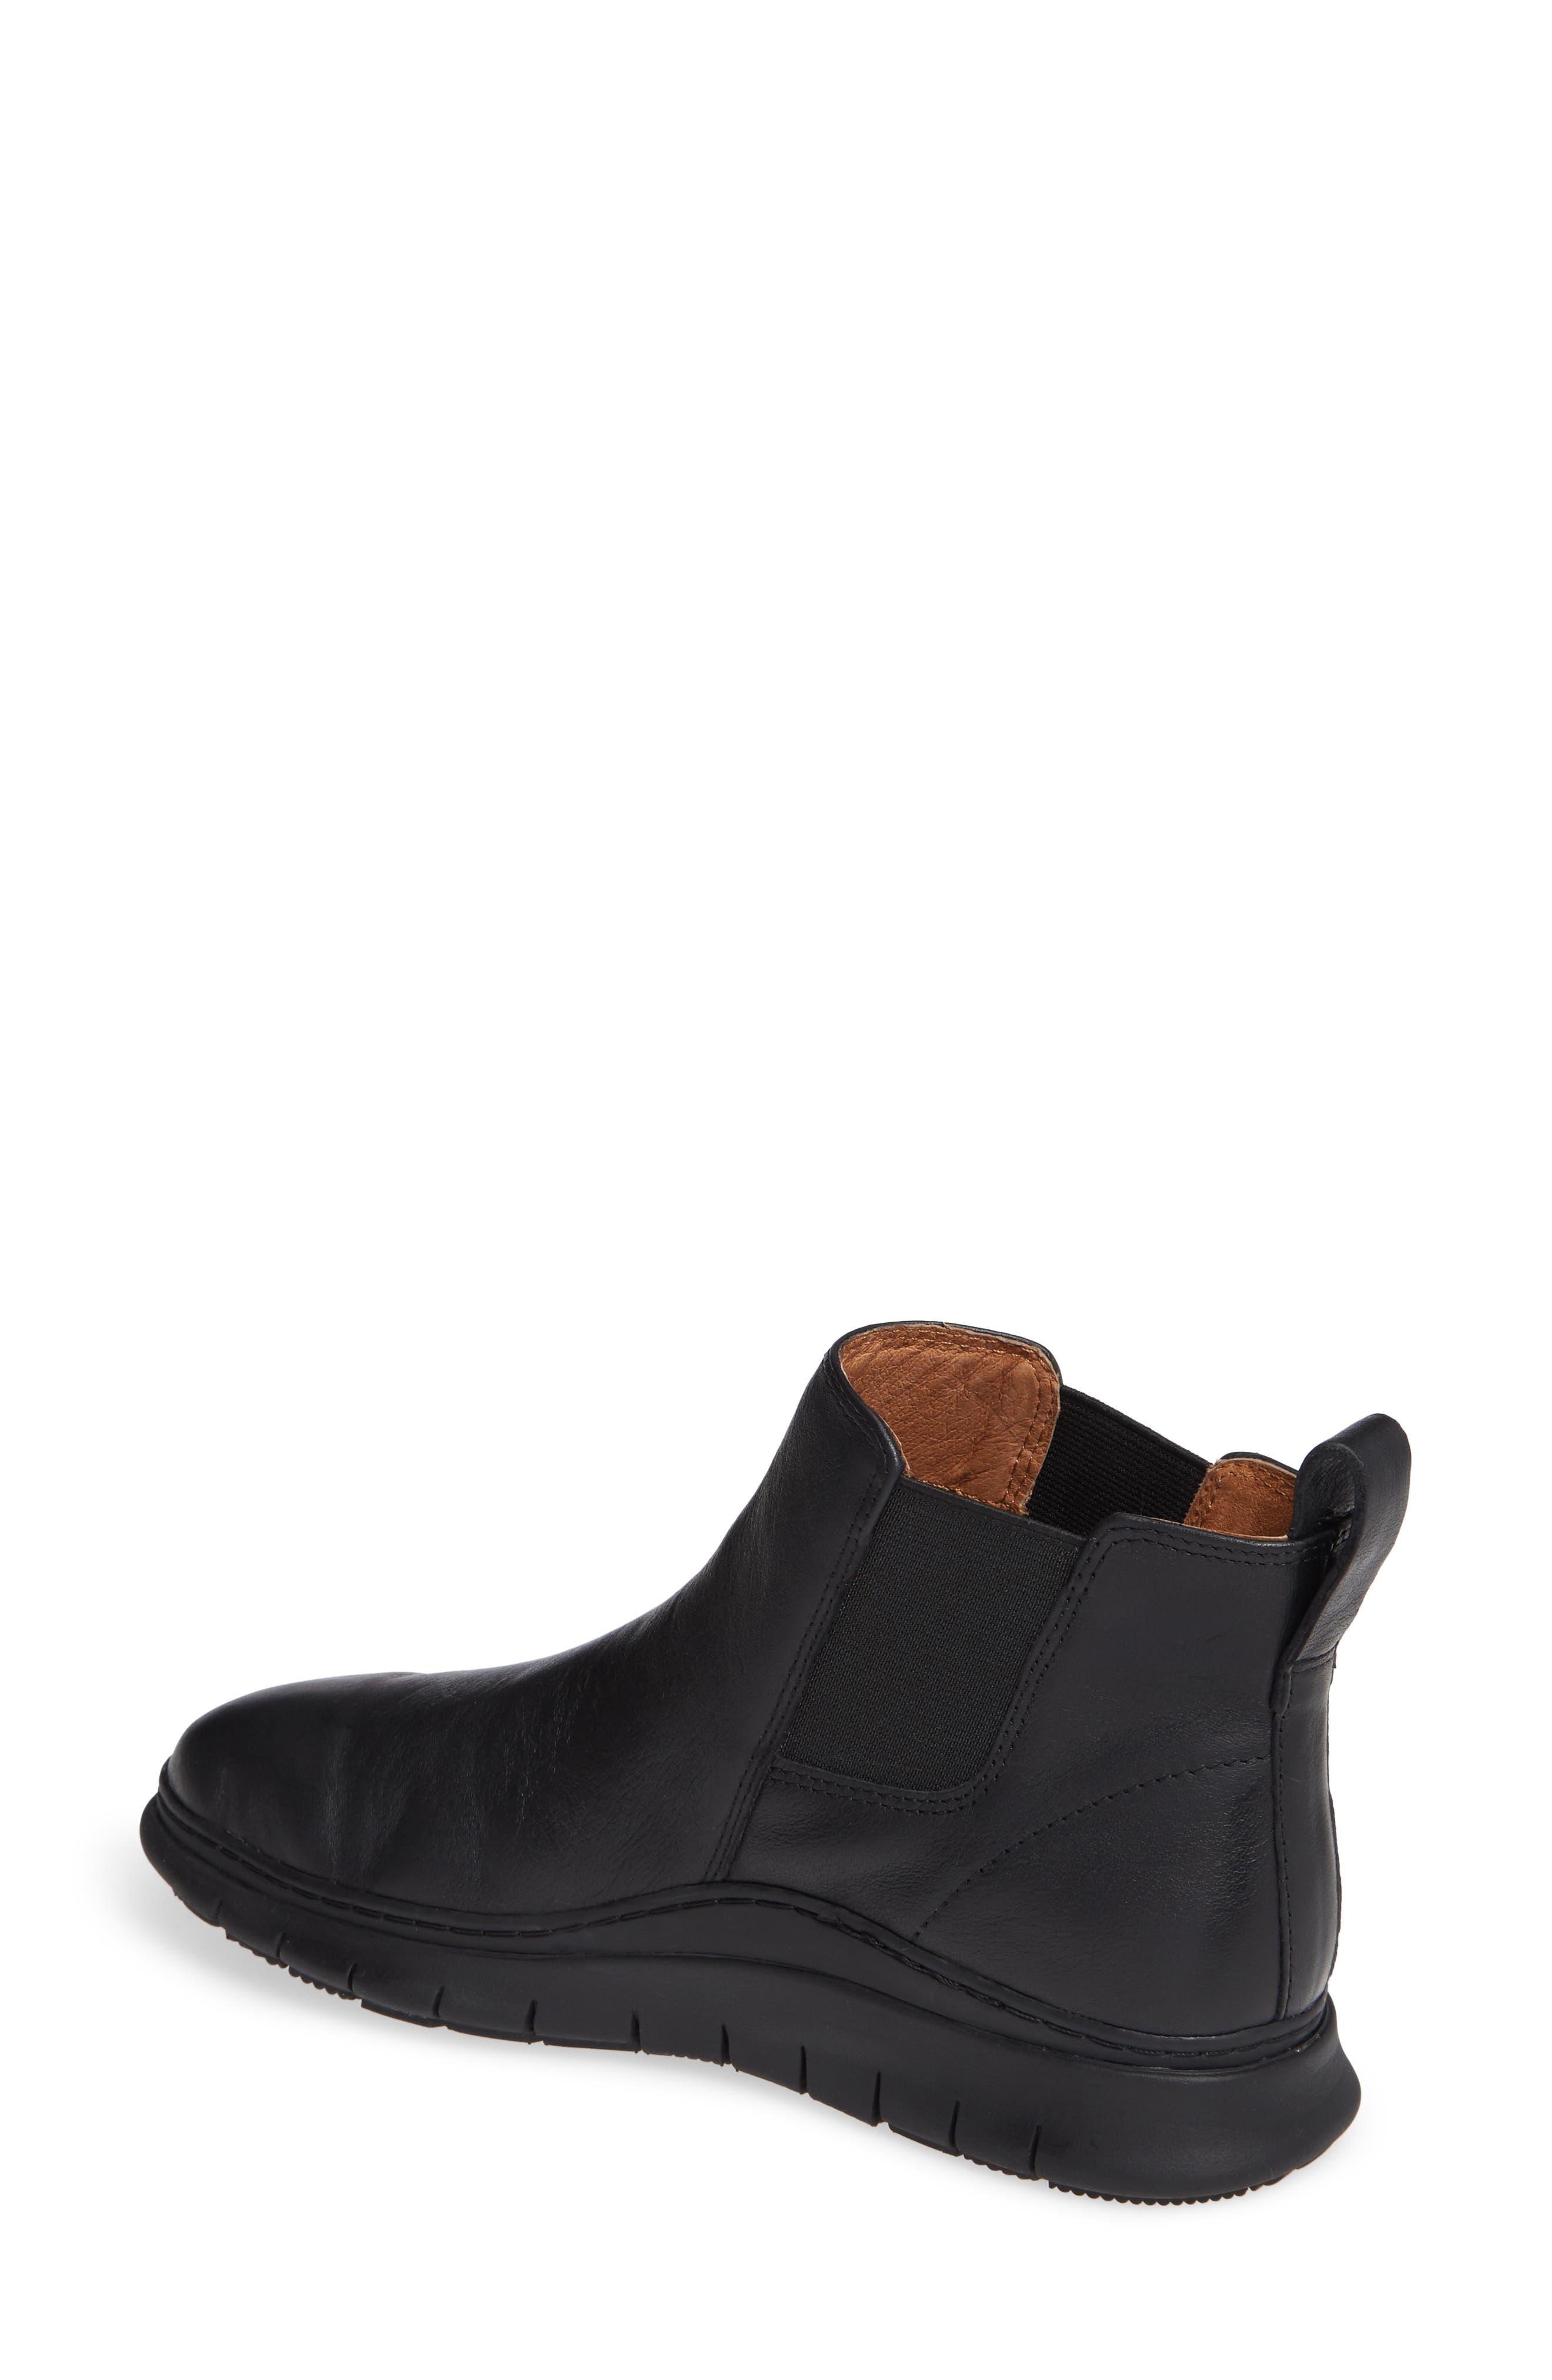 Kaufman Sneaker,                             Alternate thumbnail 2, color,                             BLACK LEATHER